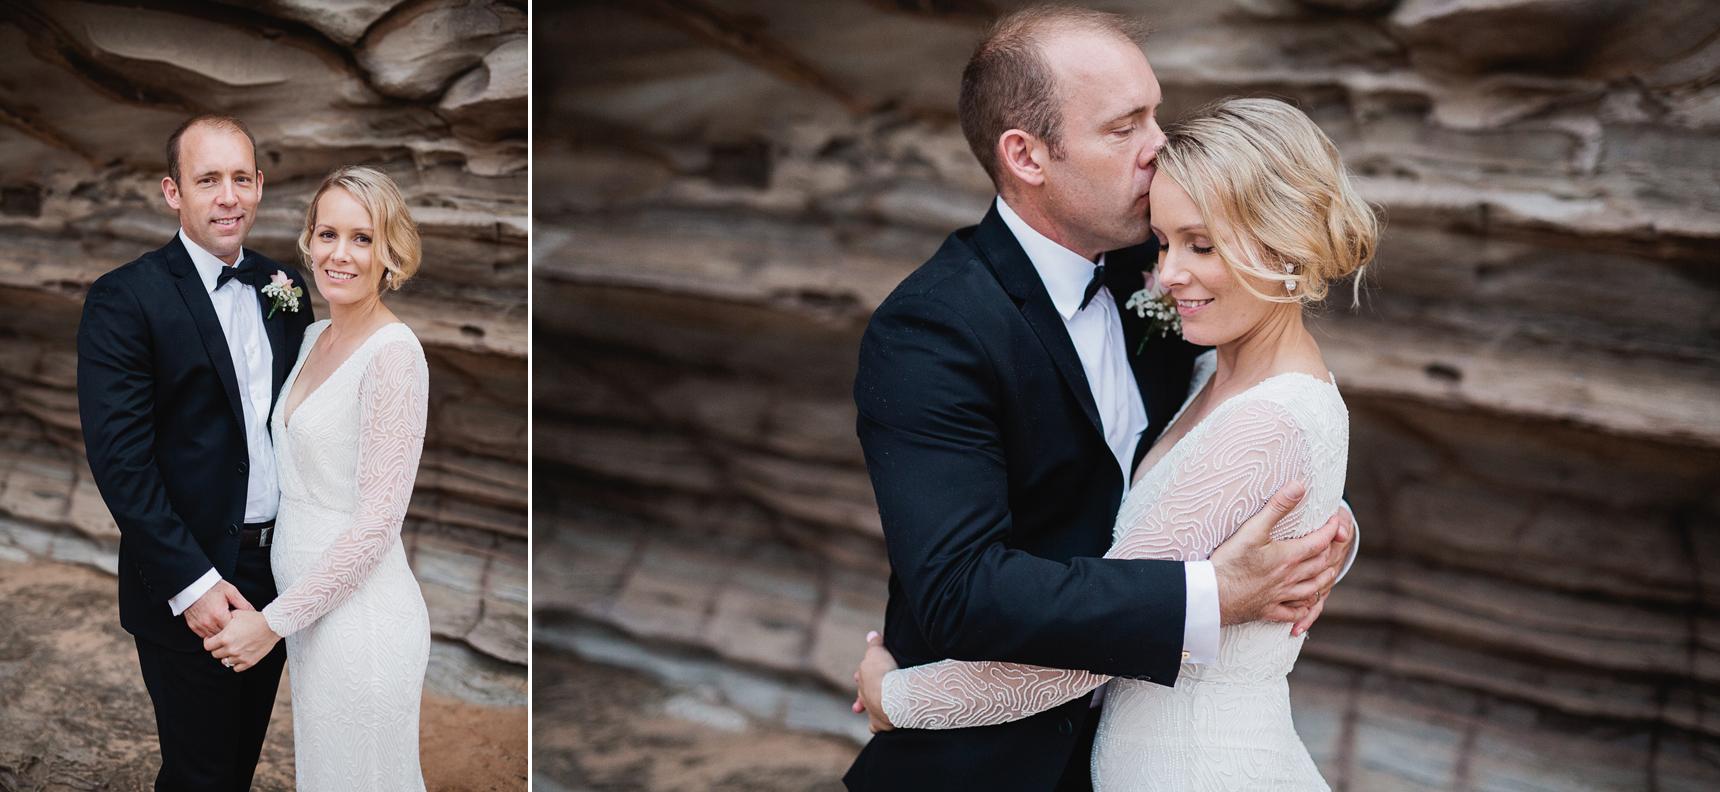 AngeRuss_MobyDicks_WhaleBeach_Wedding_Photography039.jpg